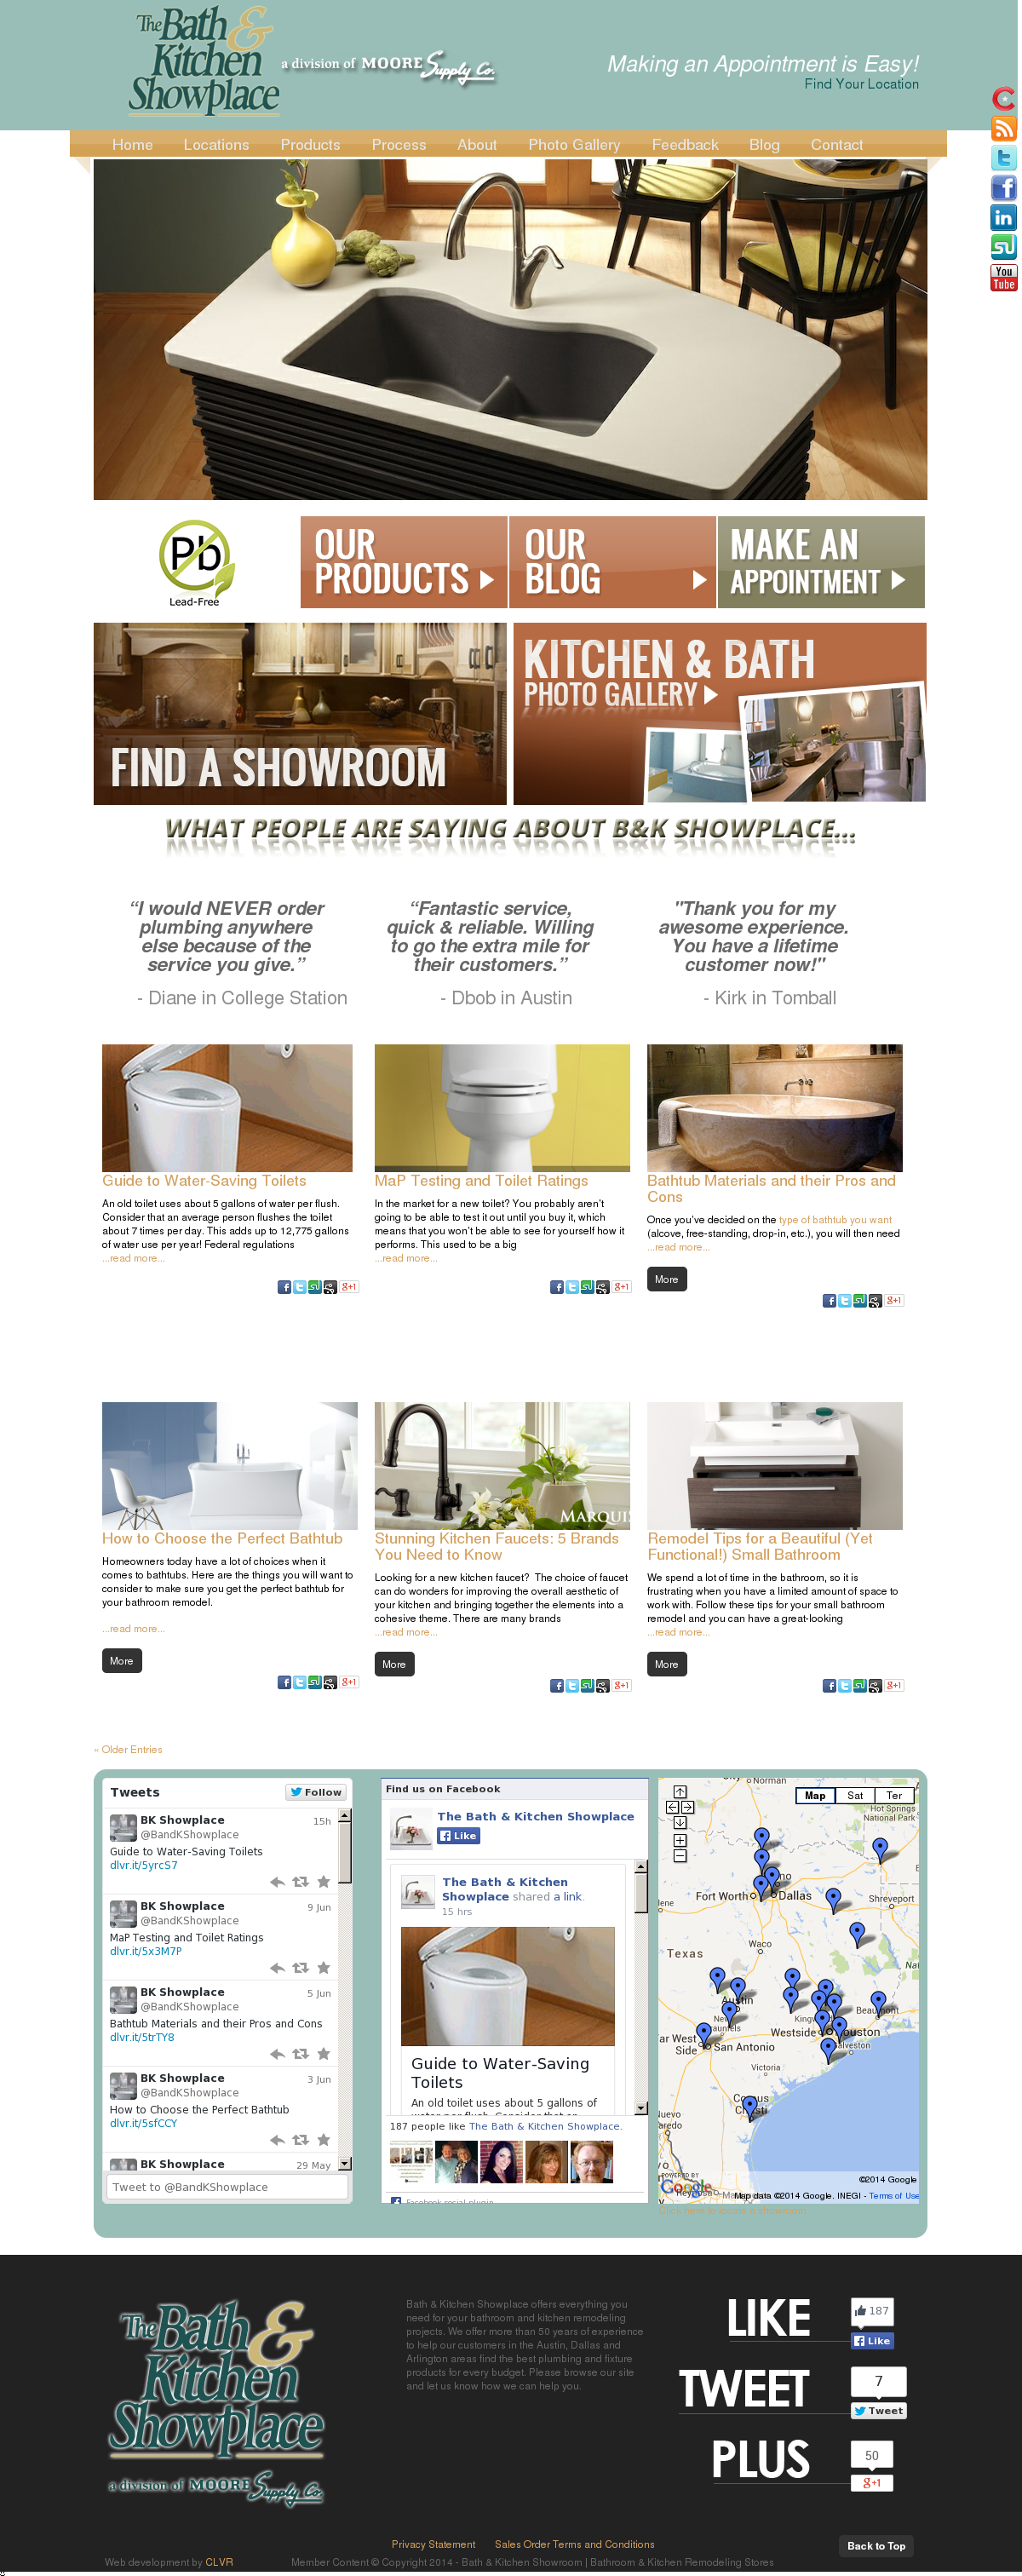 Bath U0026 Kitchen Showplace Competitors, Revenue And Employees   Owler Company  Profile